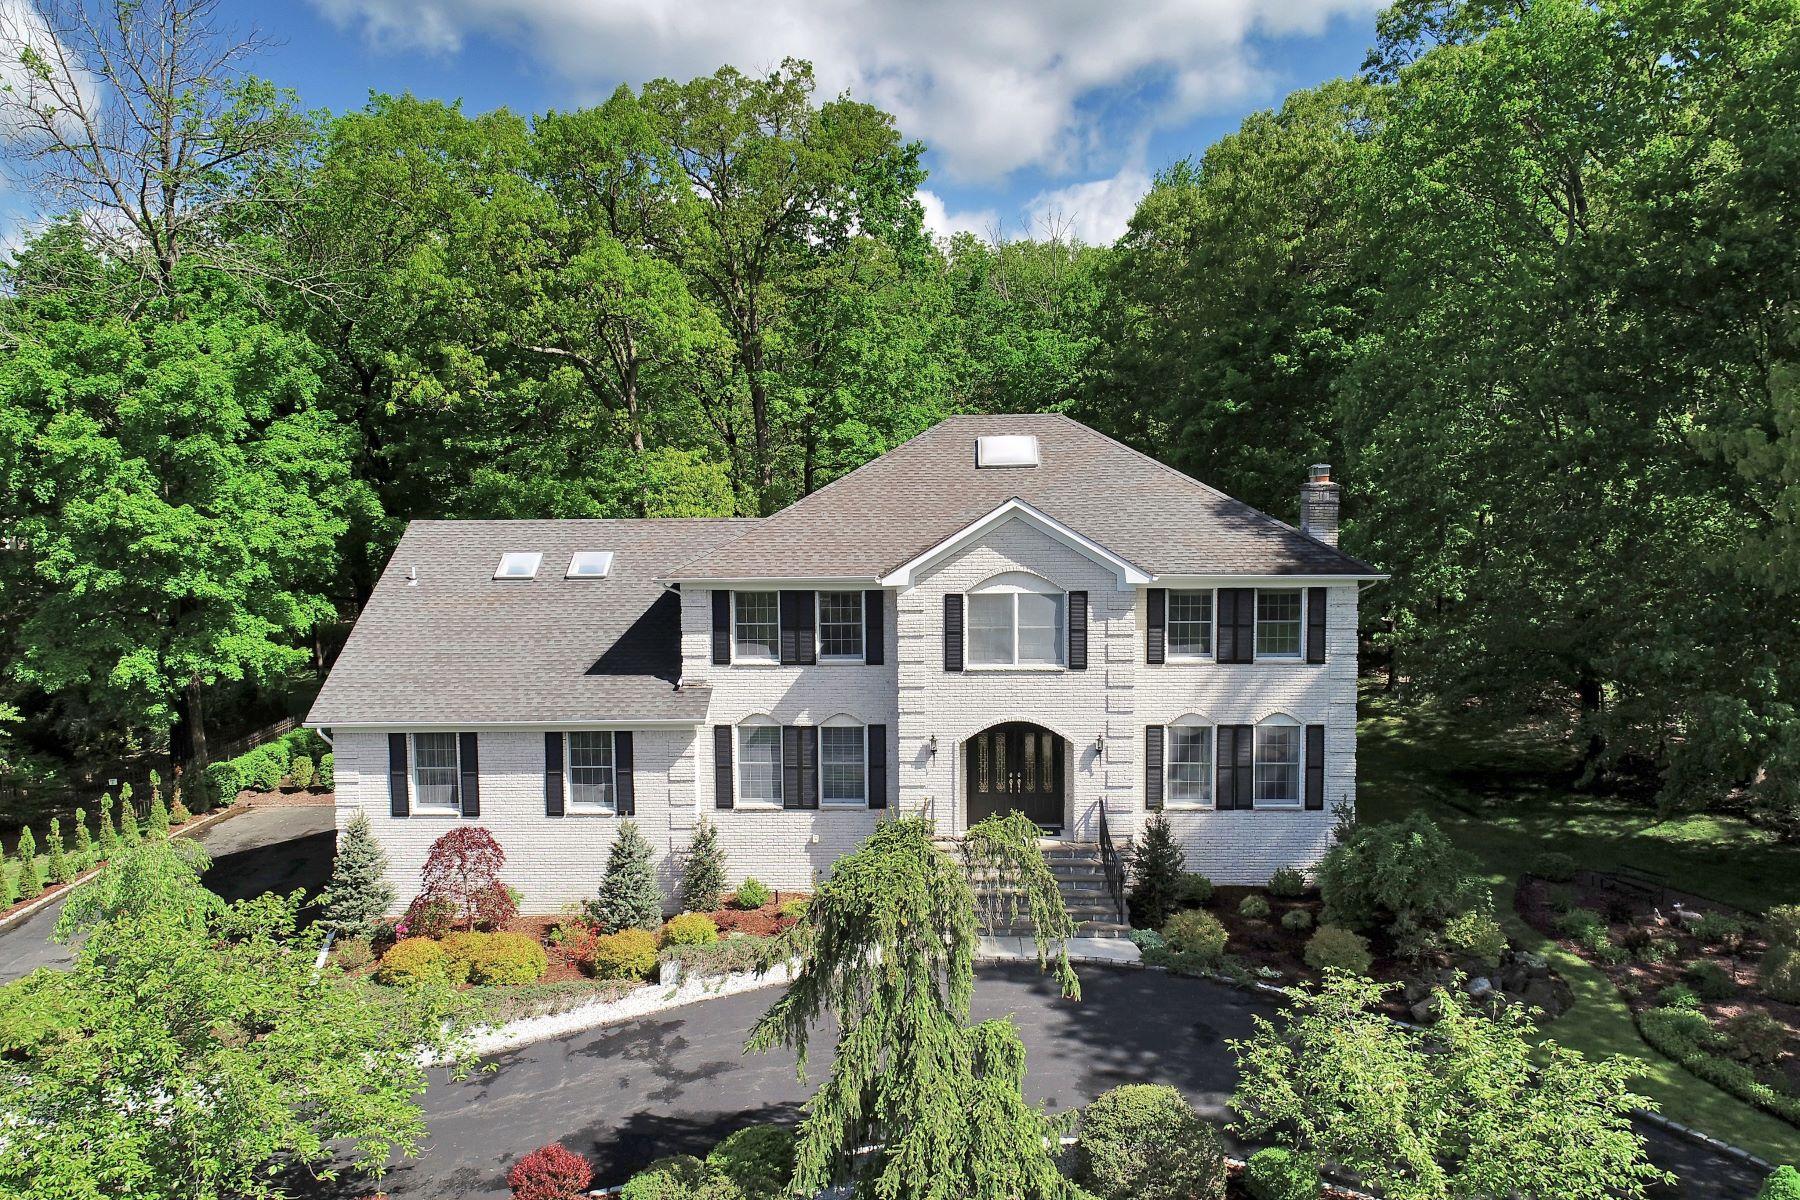 Single Family Homes для того Продажа на Outstanding Grand Colonial 10 Garrity Terrace, Pine Brook, Нью-Джерси 07058 Соединенные Штаты